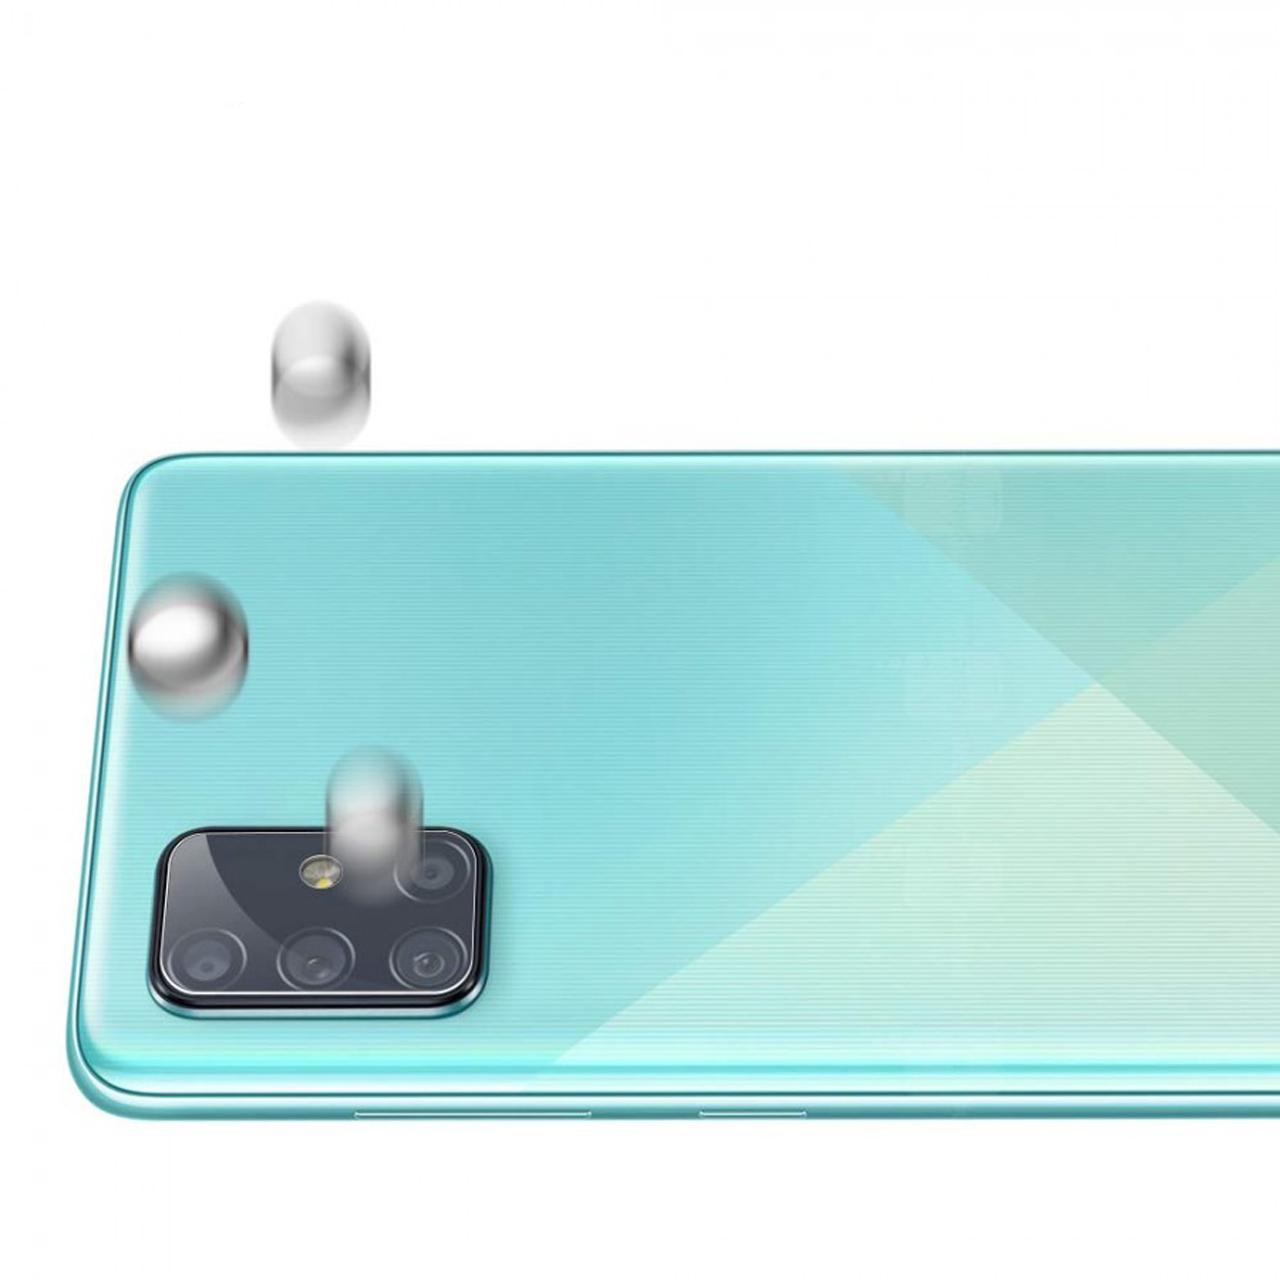 محافظ لنز دوربین سیحان مدل GLP مناسب برای گوشی موبایل سامسونگ Galaxy A51 main 1 1